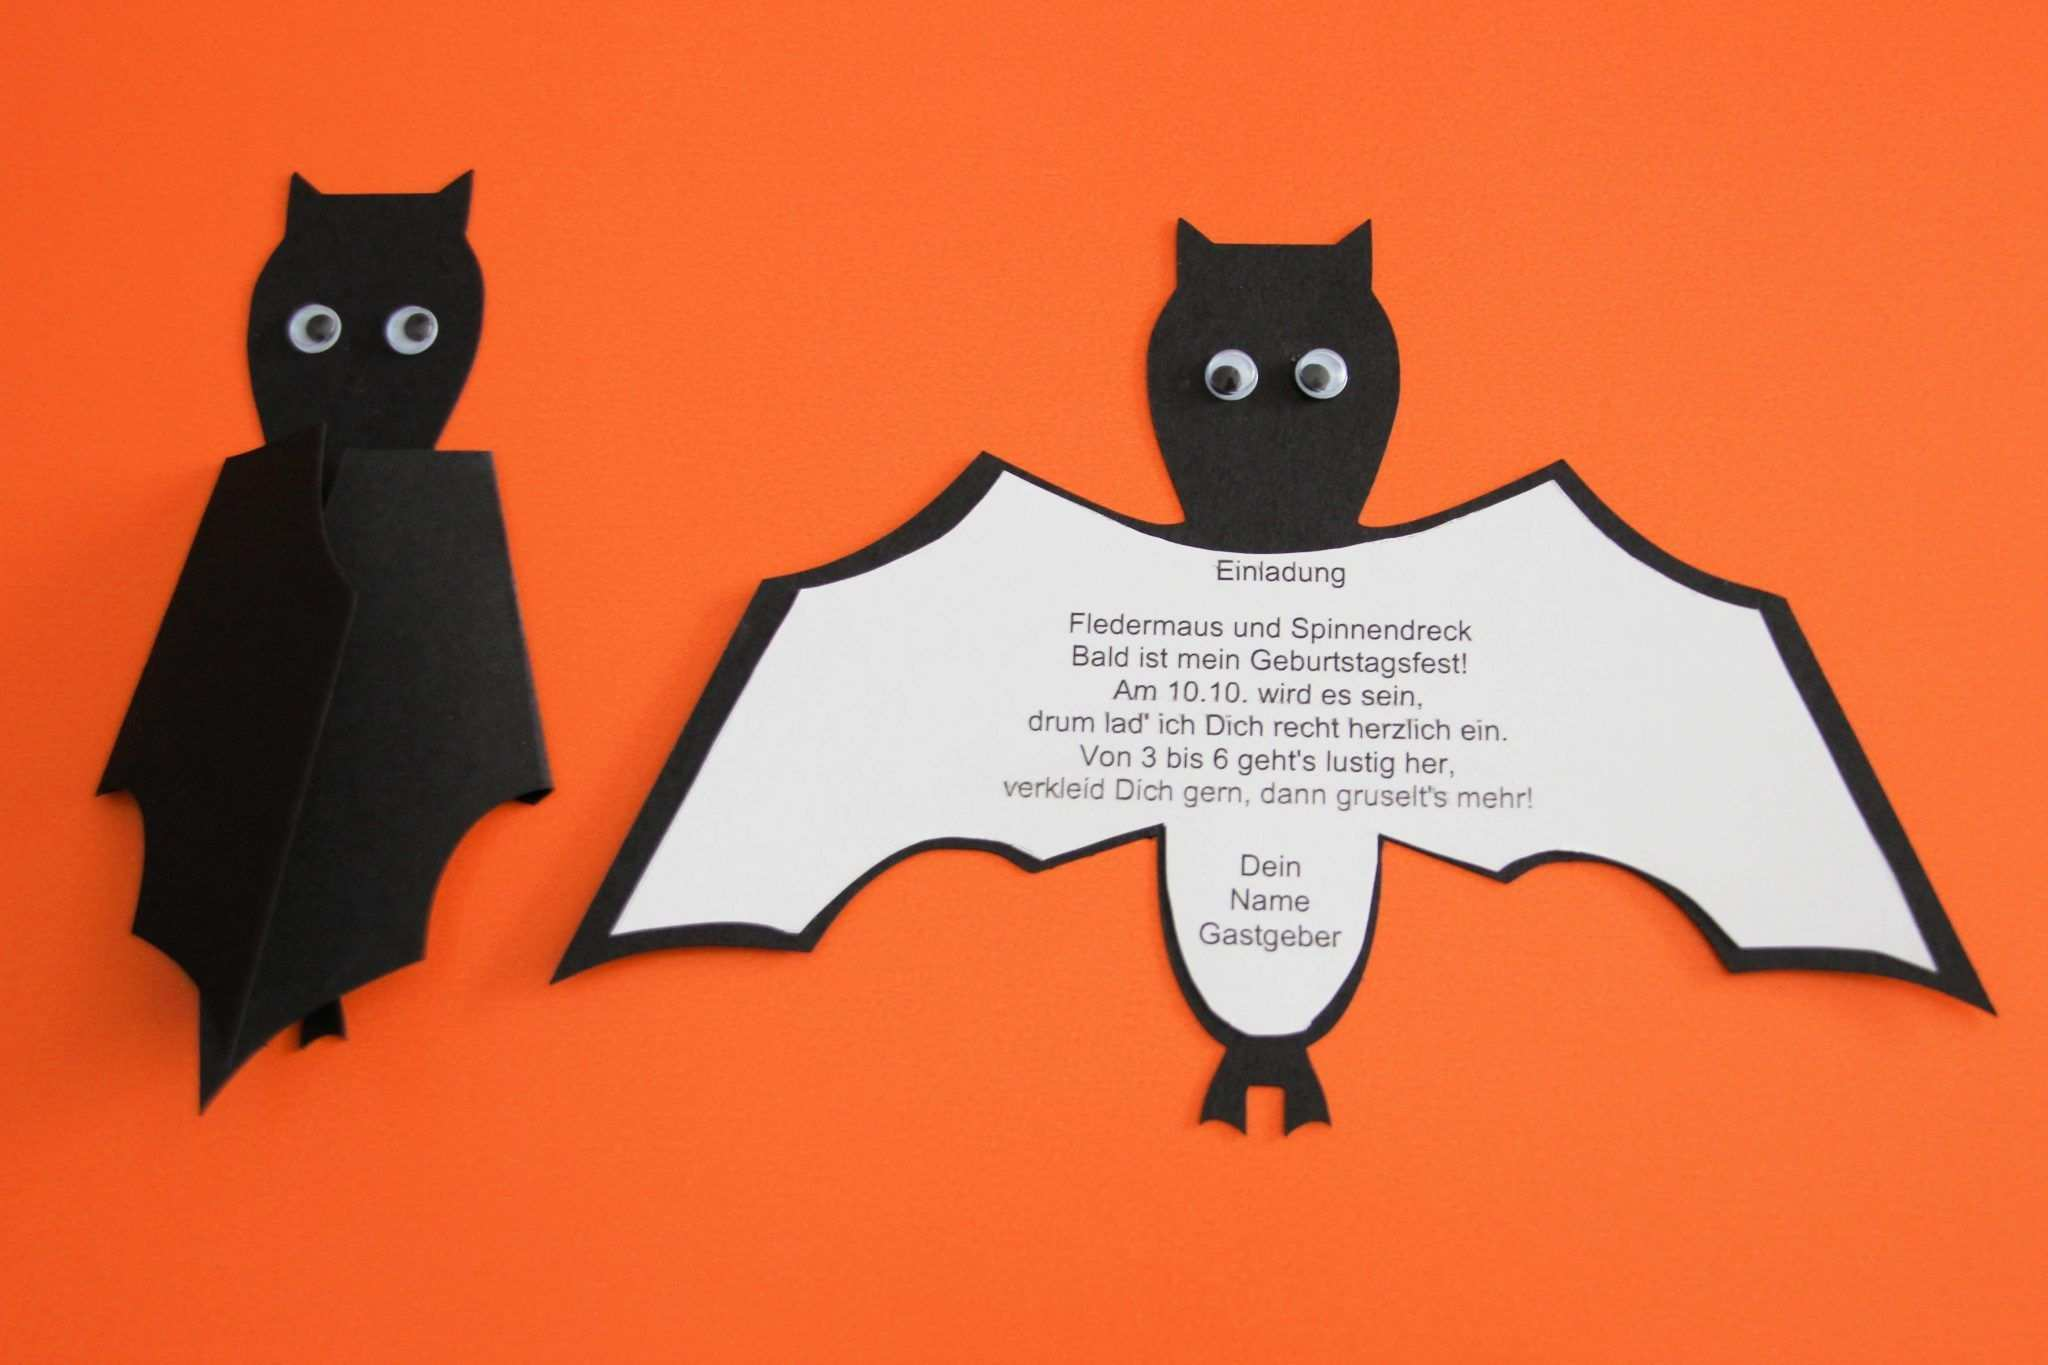 Halloween Einladung Kostenlos Halloween Einladungskarte Halloween Einladung Kurbis Halloween Einladung Halloween Kindergeburtstag Halloween Party Ideen Kinder